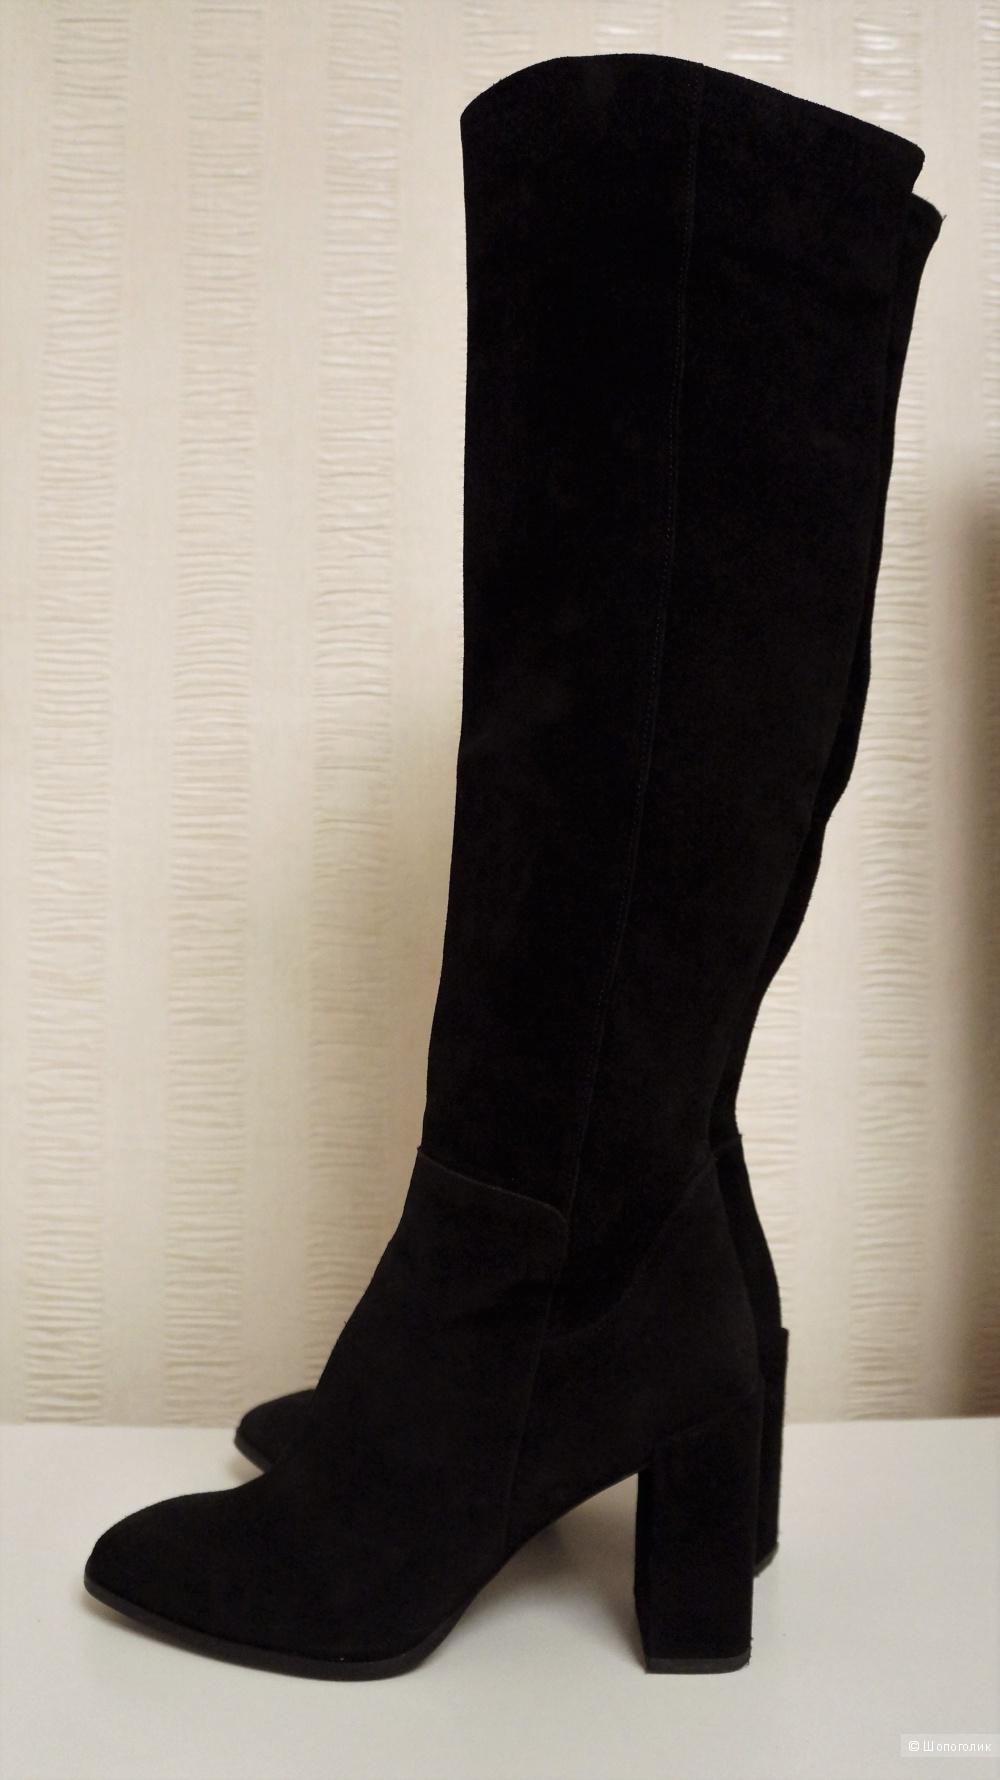 Сапоги Zara, размер 40 EU (39 RU)